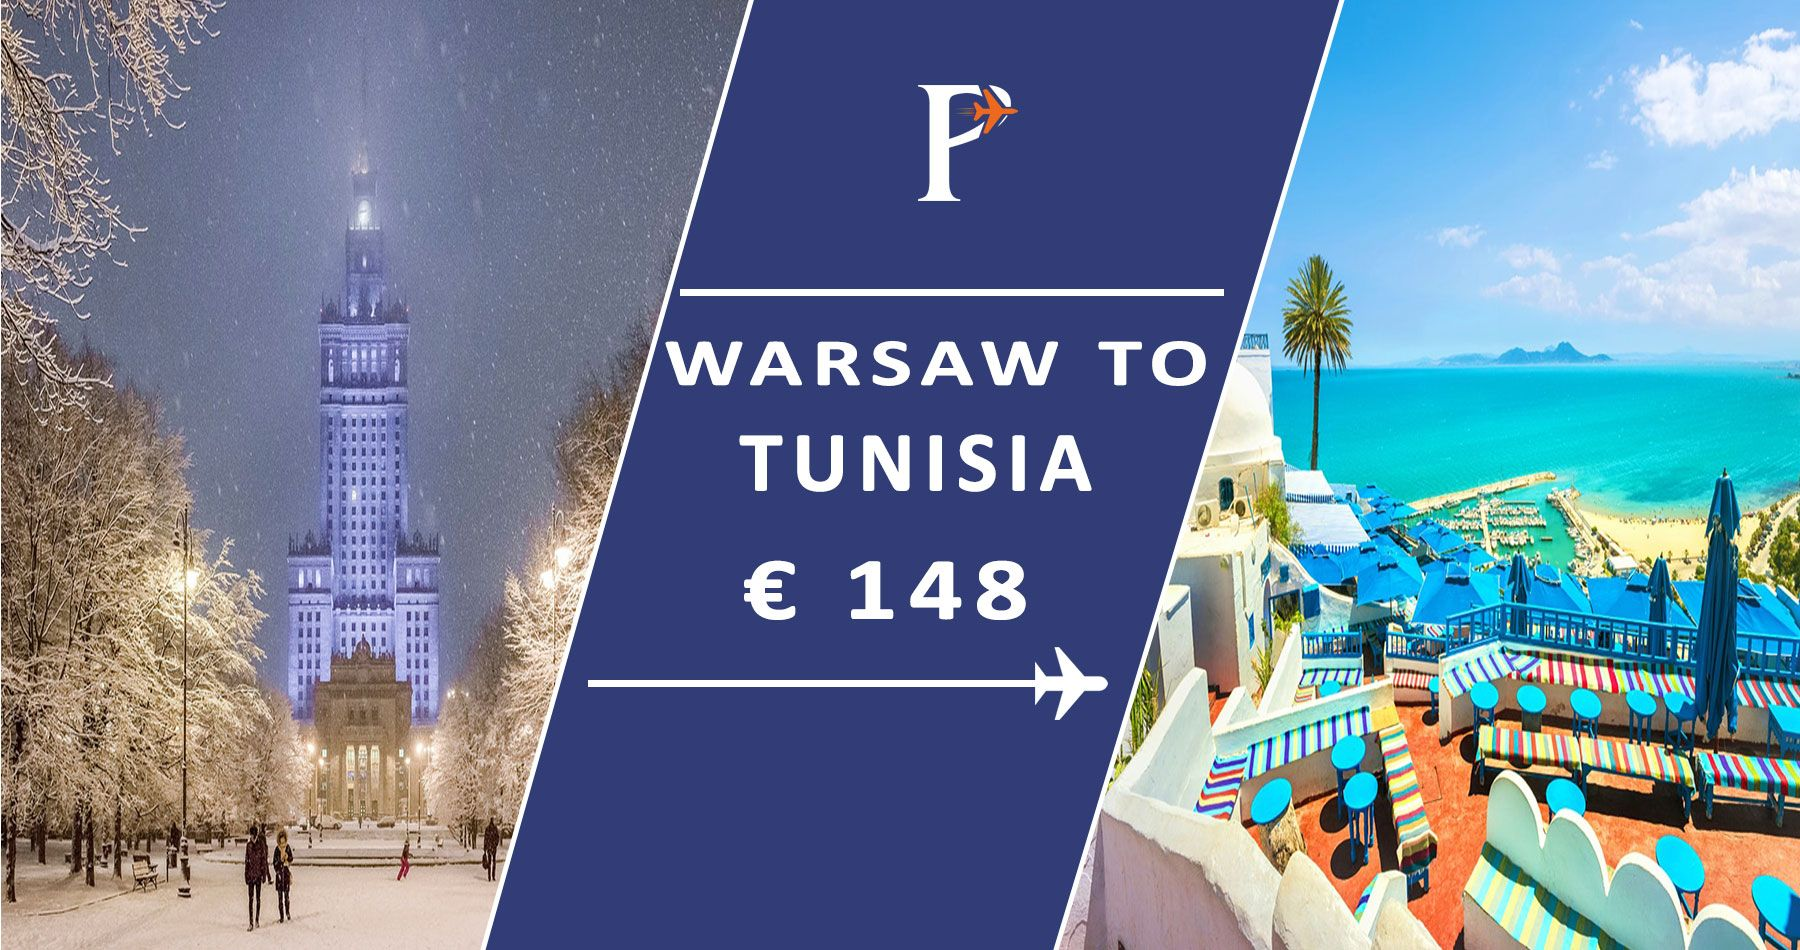 Book Flights from Warsaw, Poland to Tunisia Round